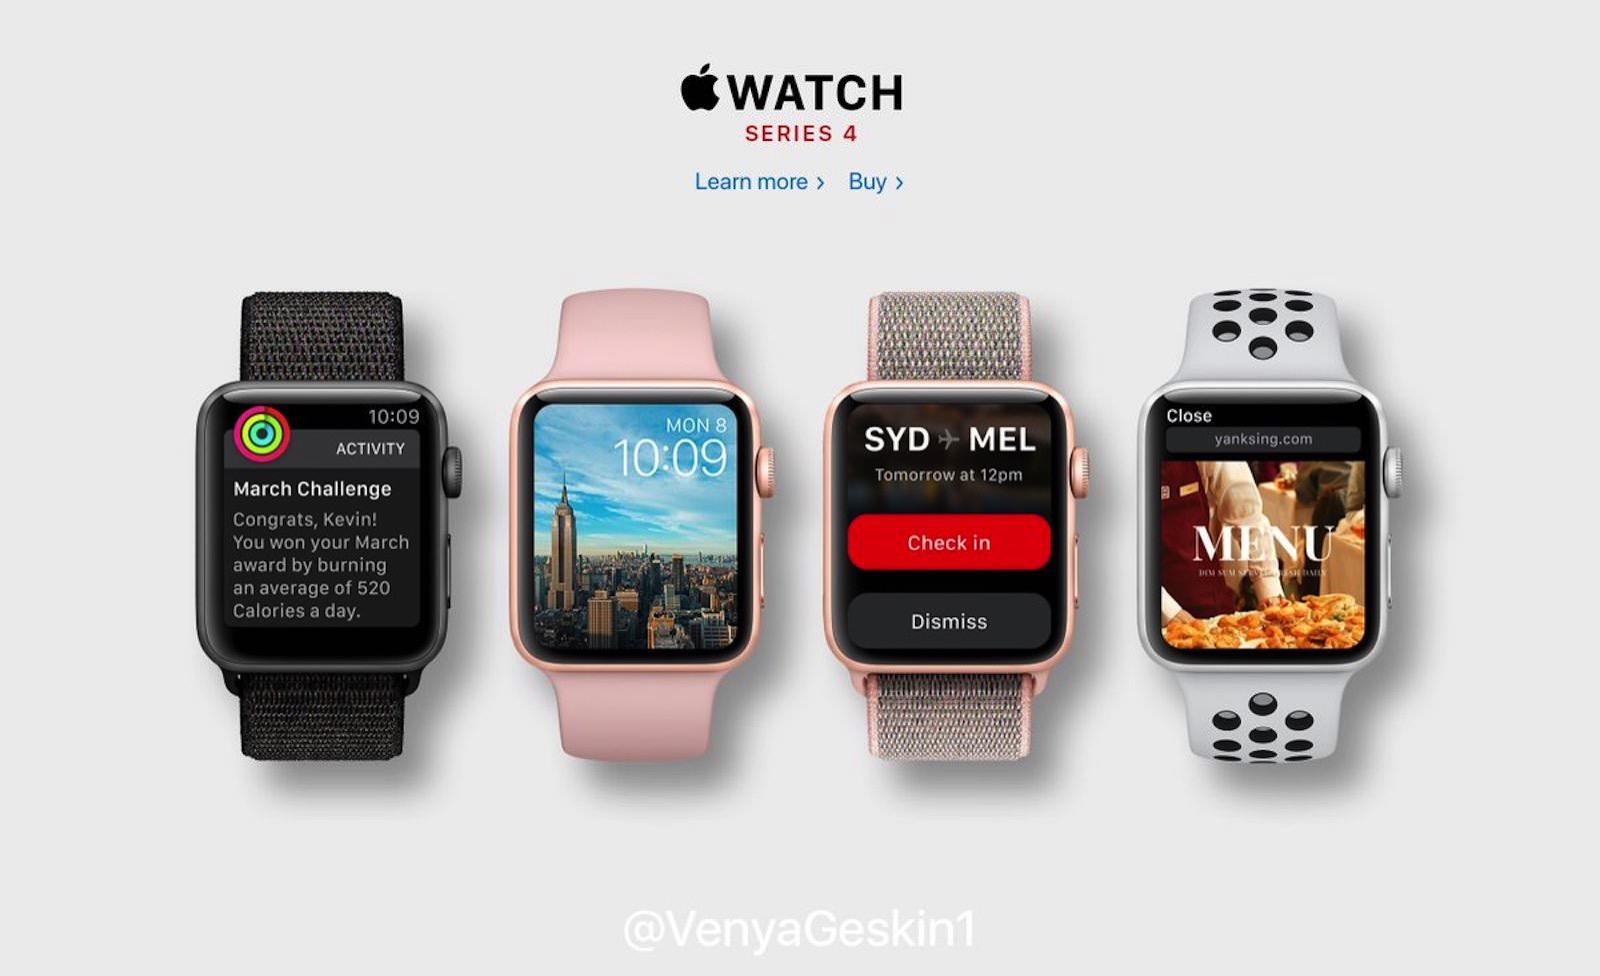 Apple-Watch-Series-4-Concept-image-1.jpg